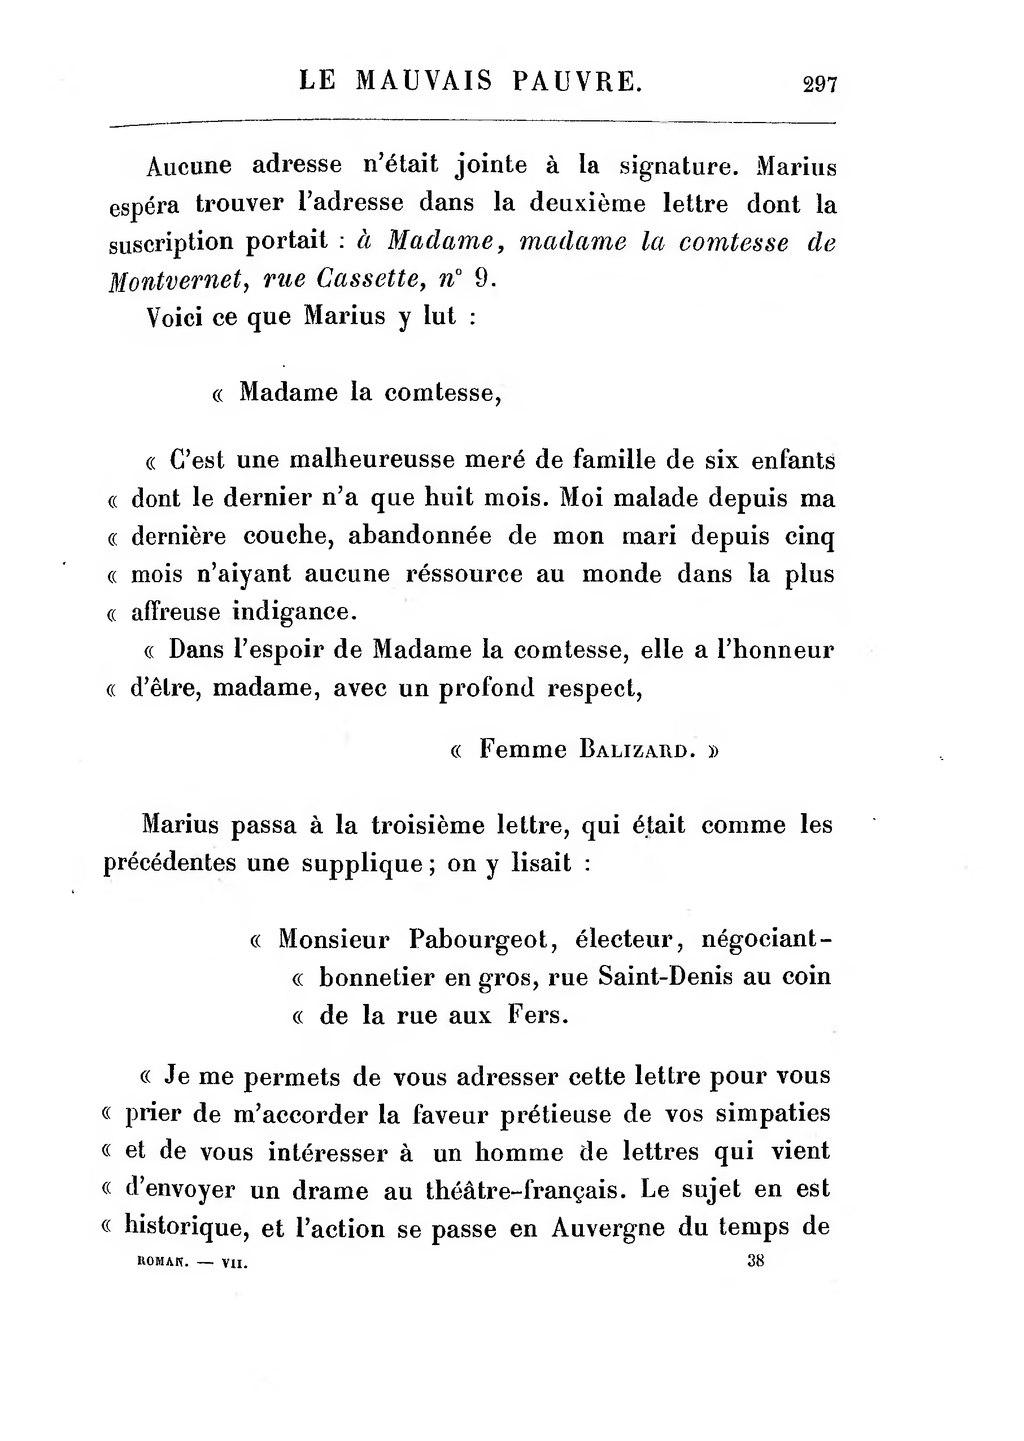 Pagehugo Les Misérables Tome Iii 1890djvu304 Wikisource